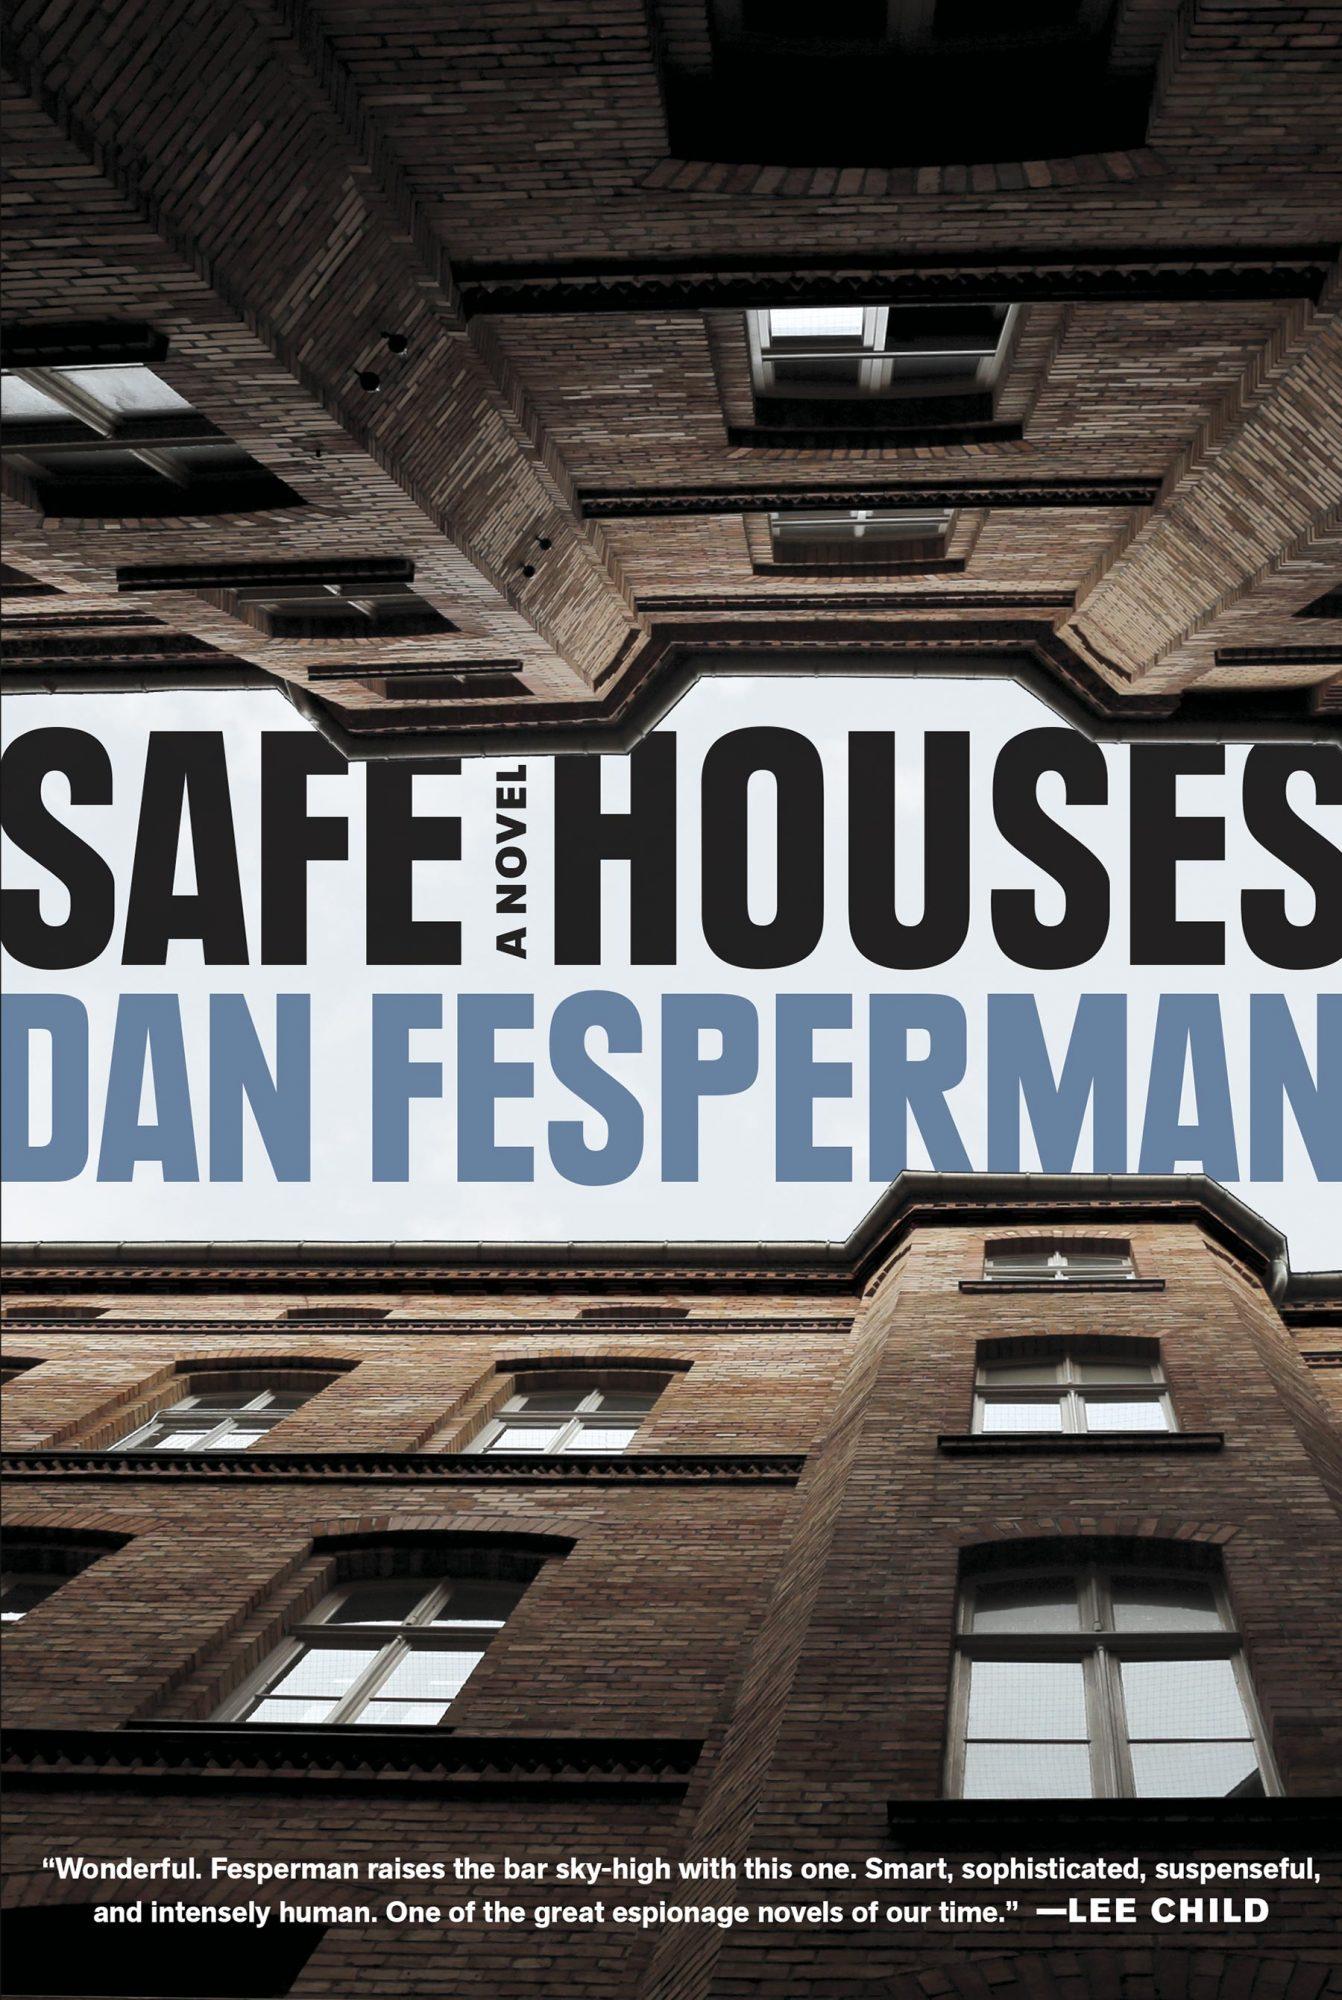 Safe Houses by Dan Fesperman CR: Knopf Doubleday